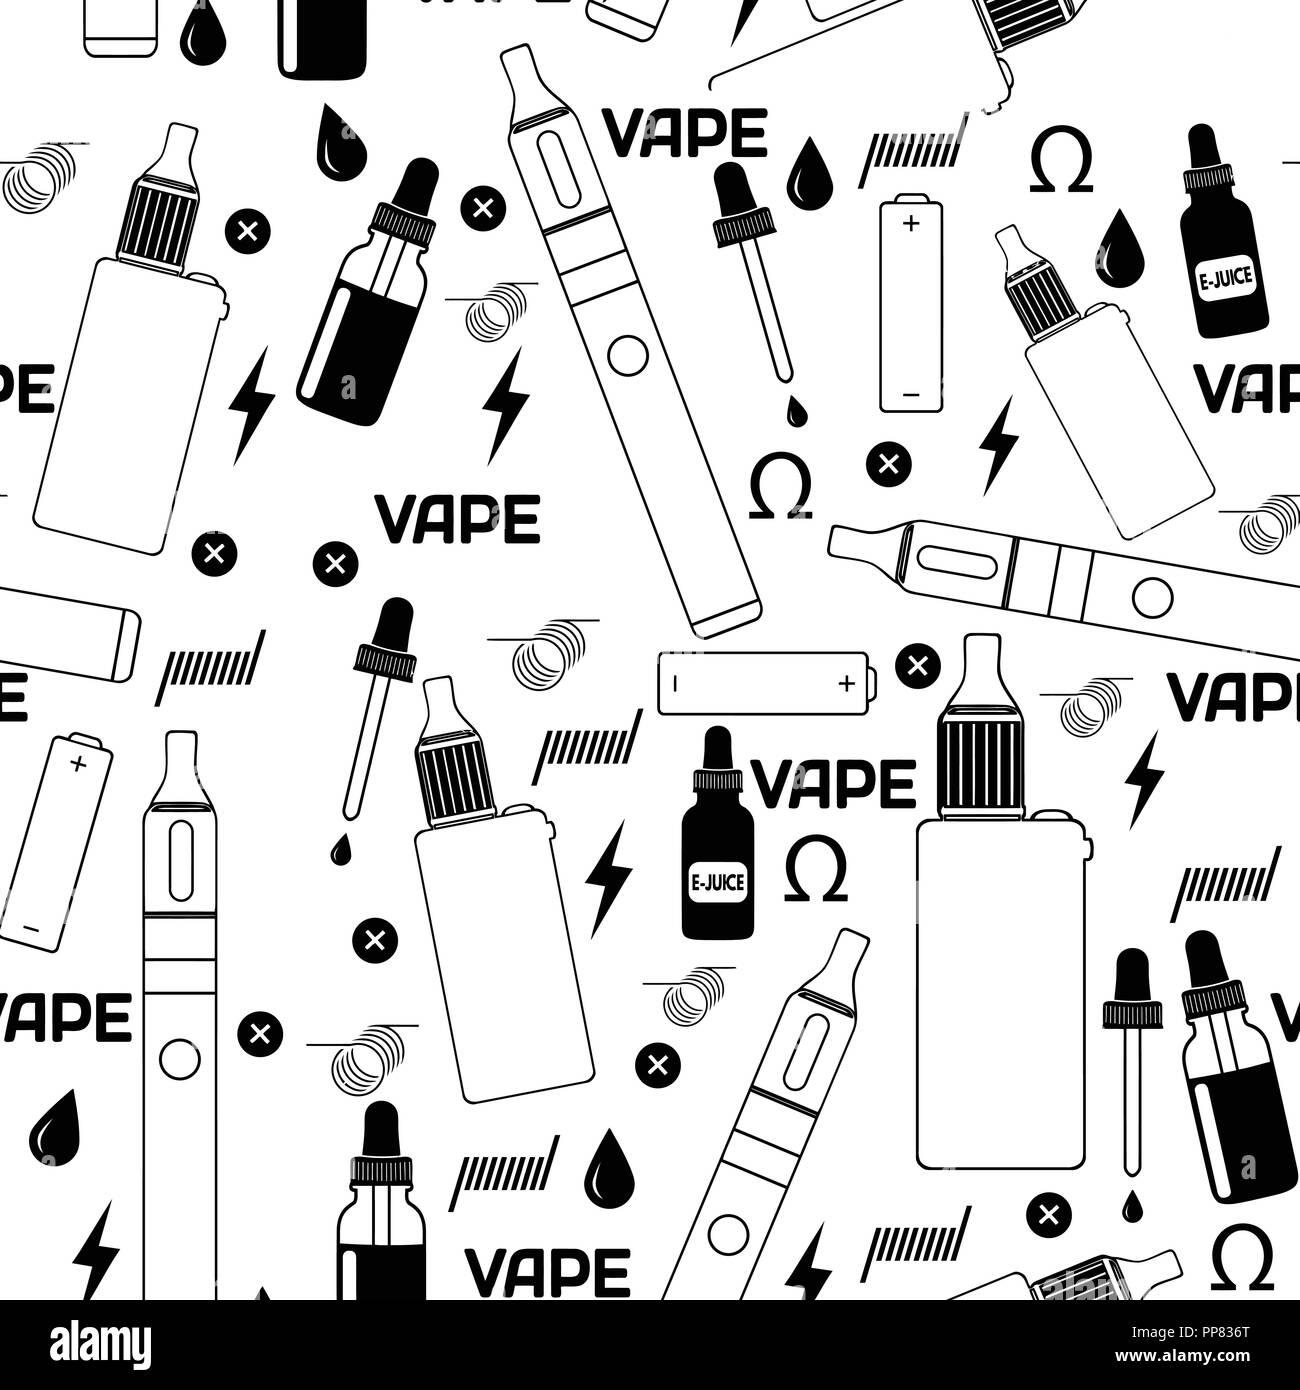 Vape shop or e-cigarette store seamless pattern on white background, vector illustration - Stock Image